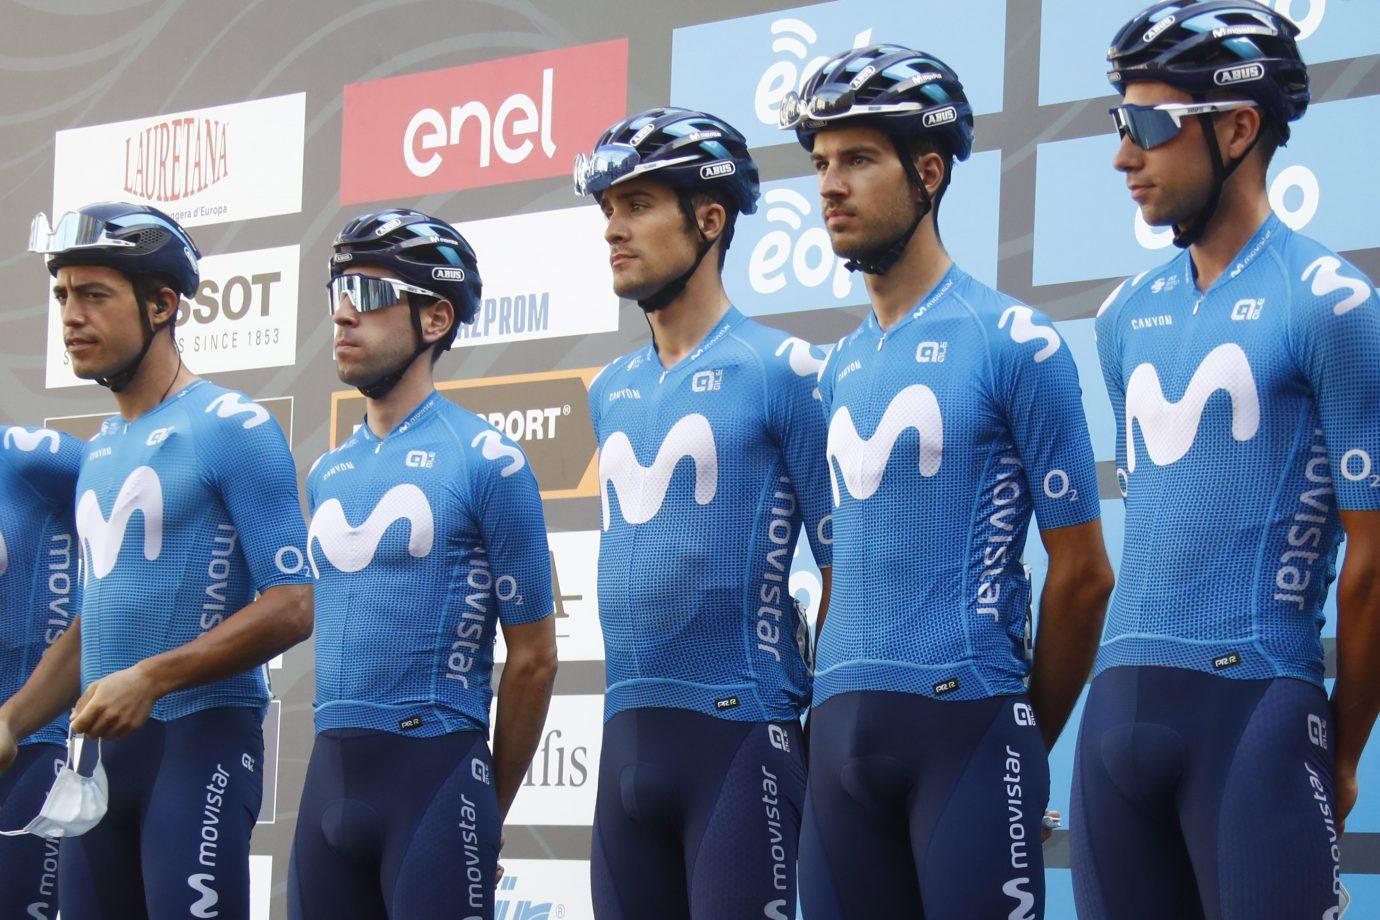 Imagen de la noticia 'Movistar Team looking for opportunities at 2020 Giro'